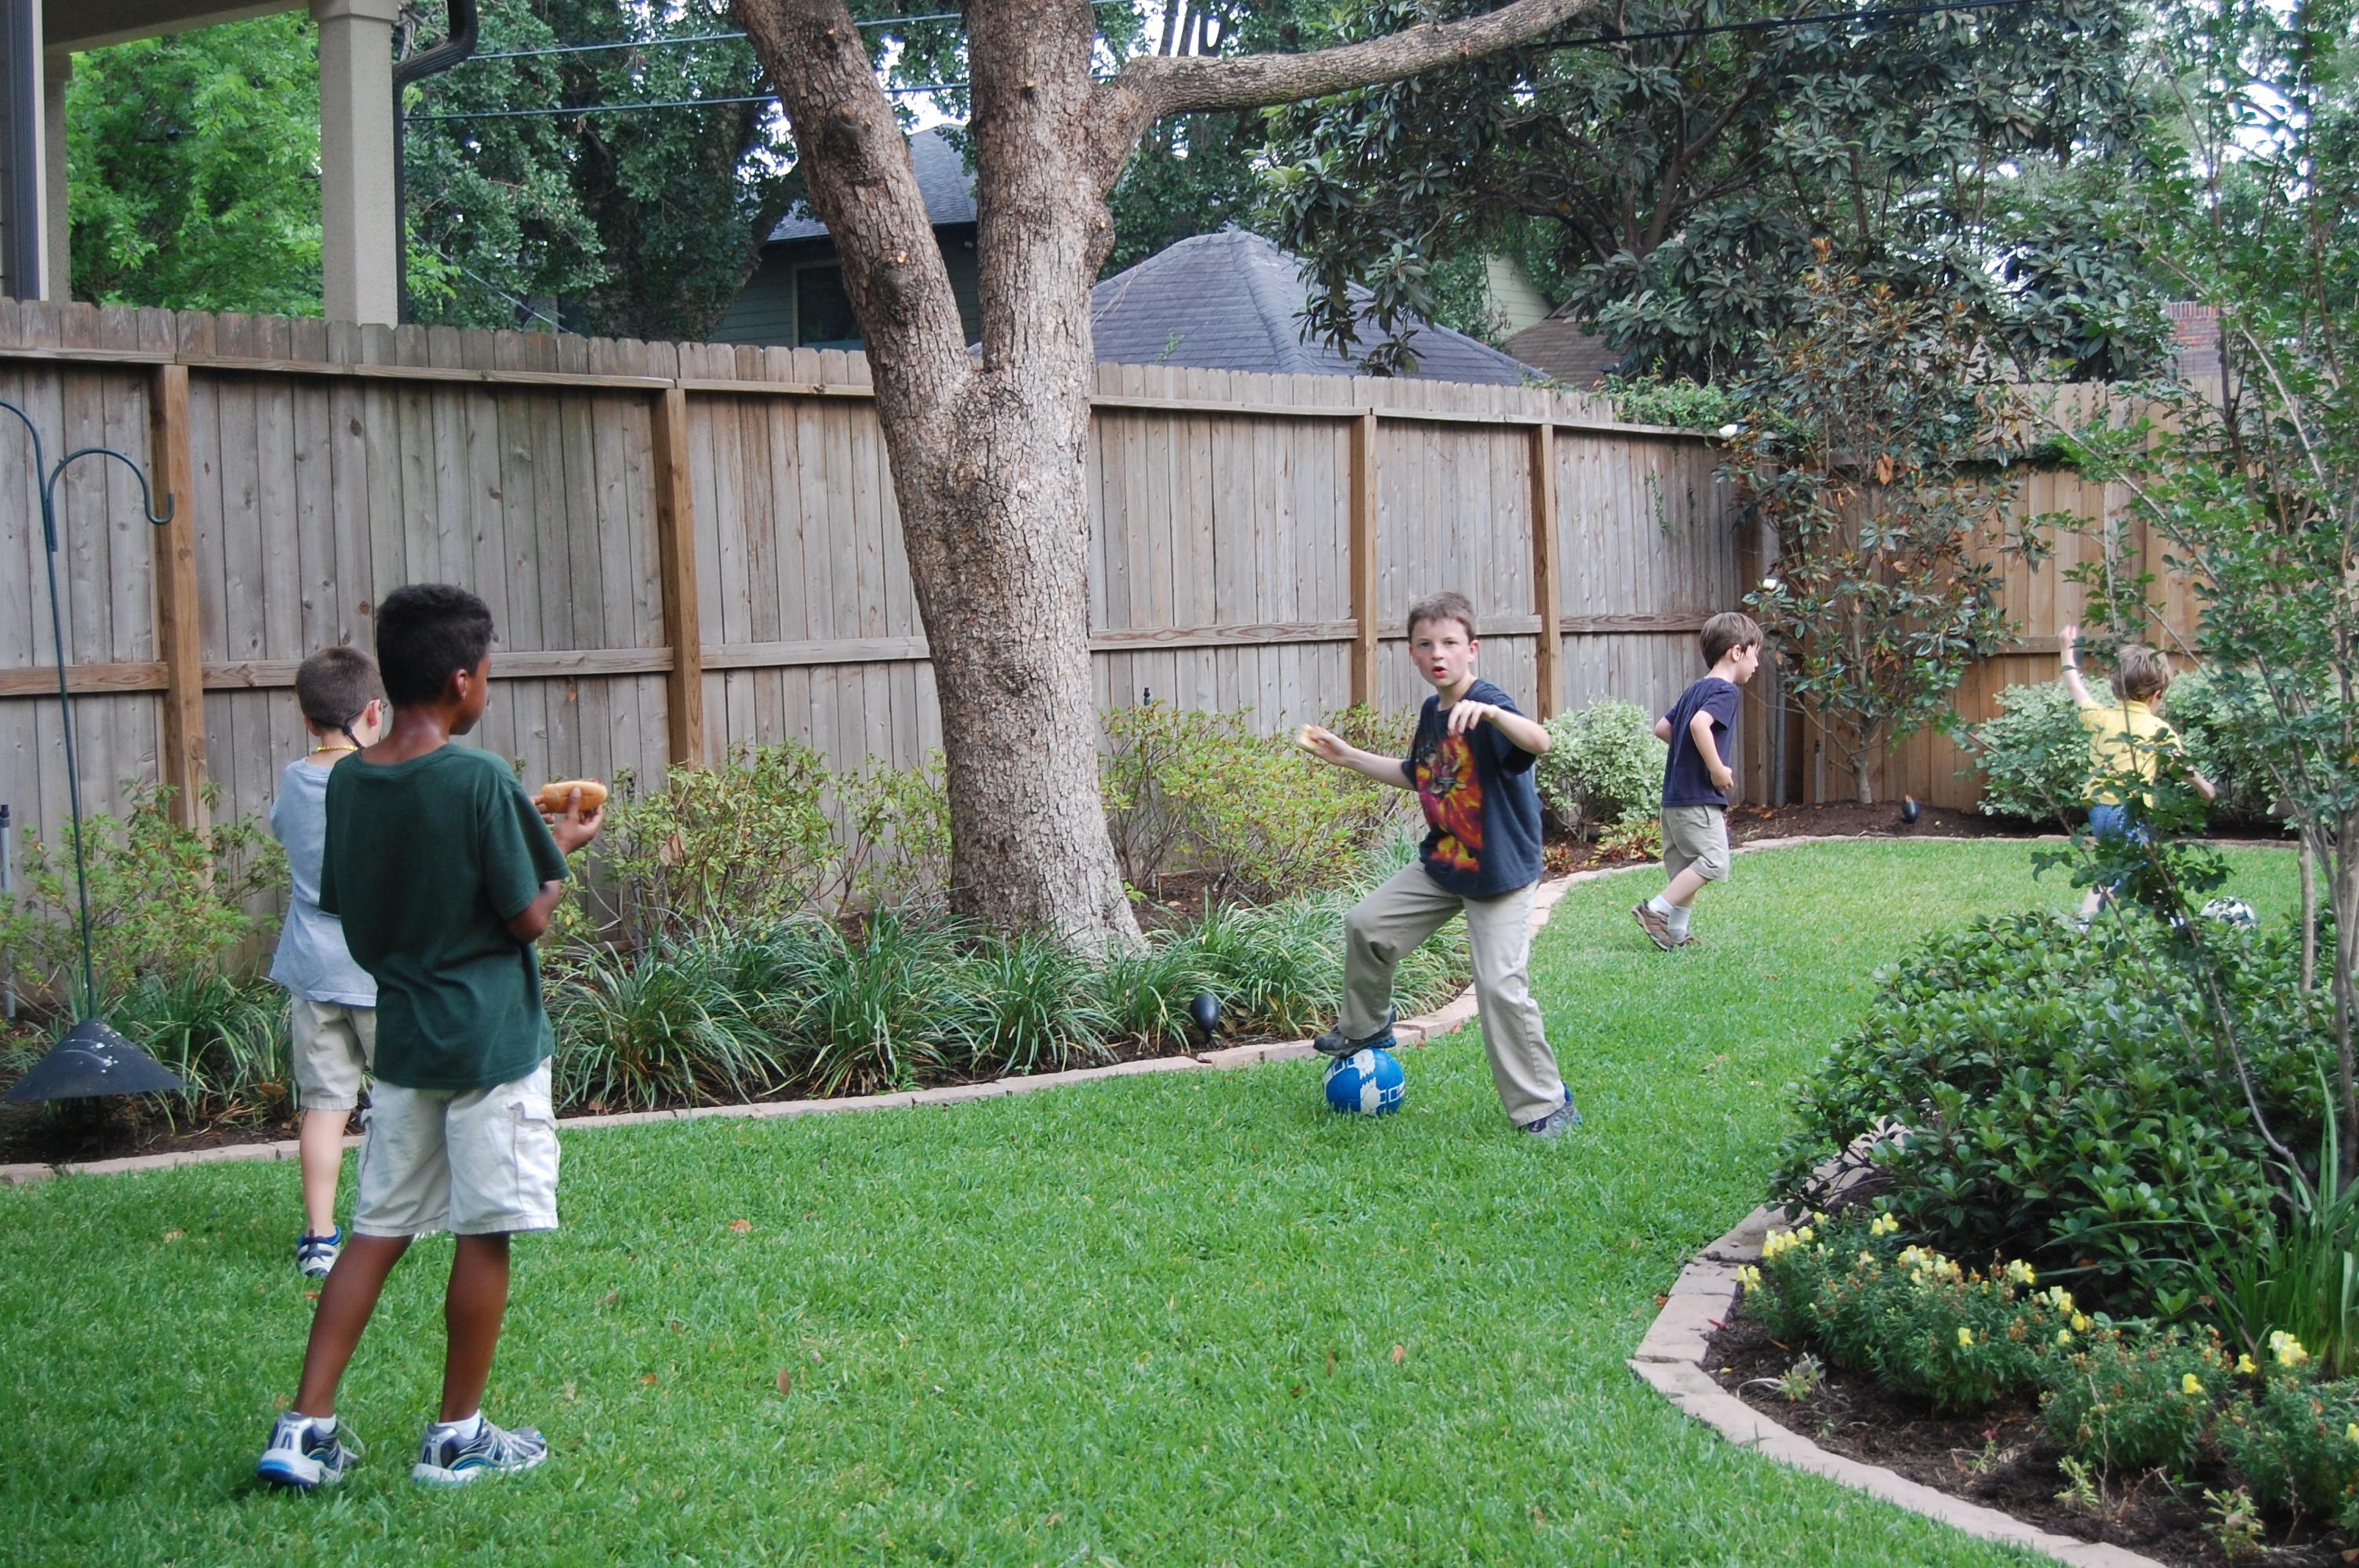 Boys Running Backyard Richwood Place Houston Texas